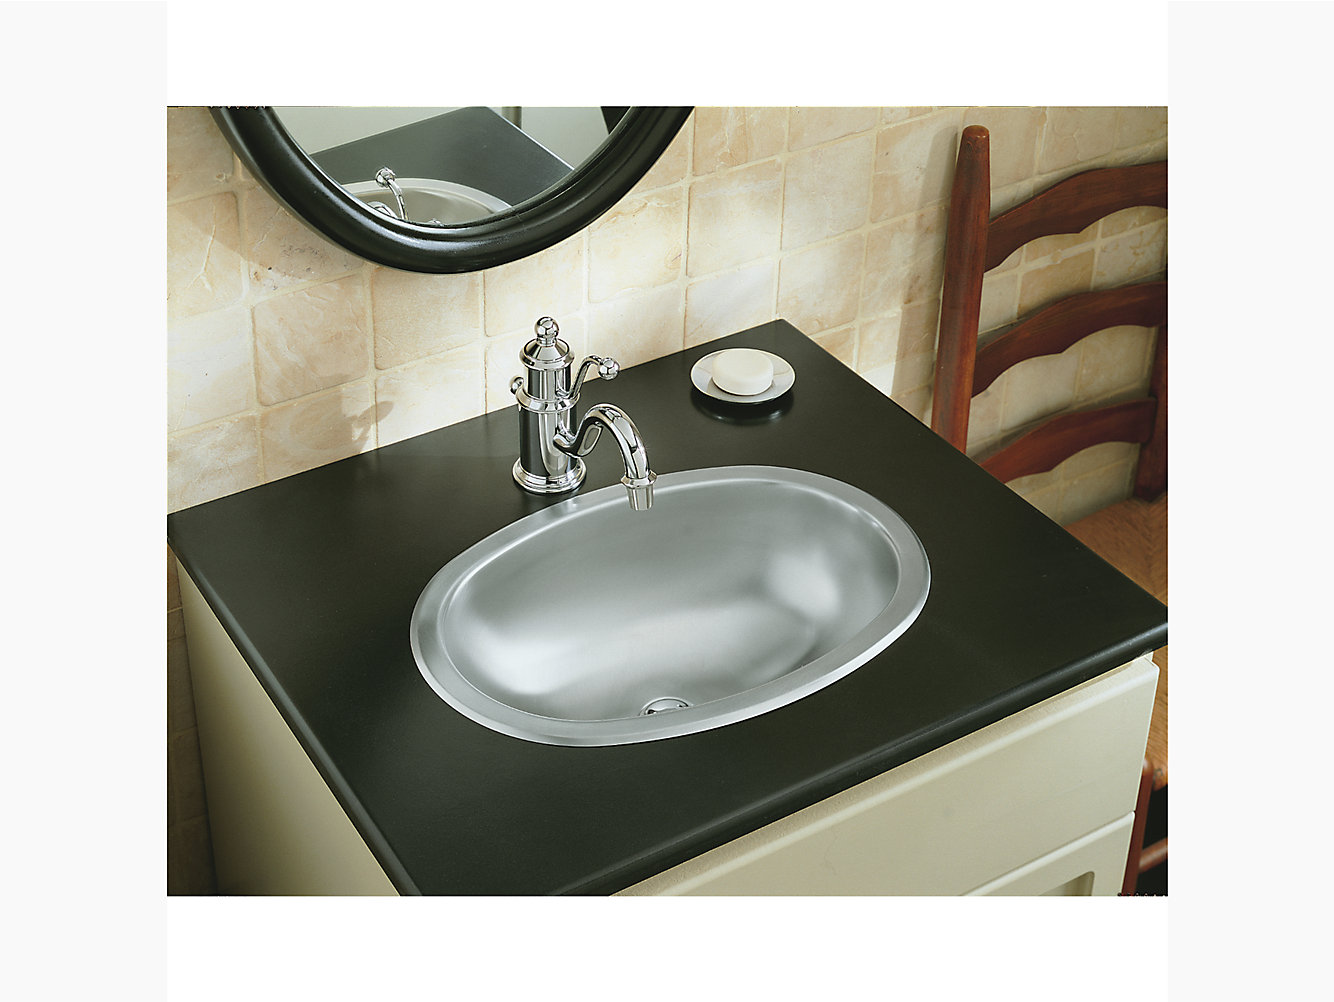 Oval Drop In Under Mount Bathroom Sink, Drop In Oval Bathroom Sinks